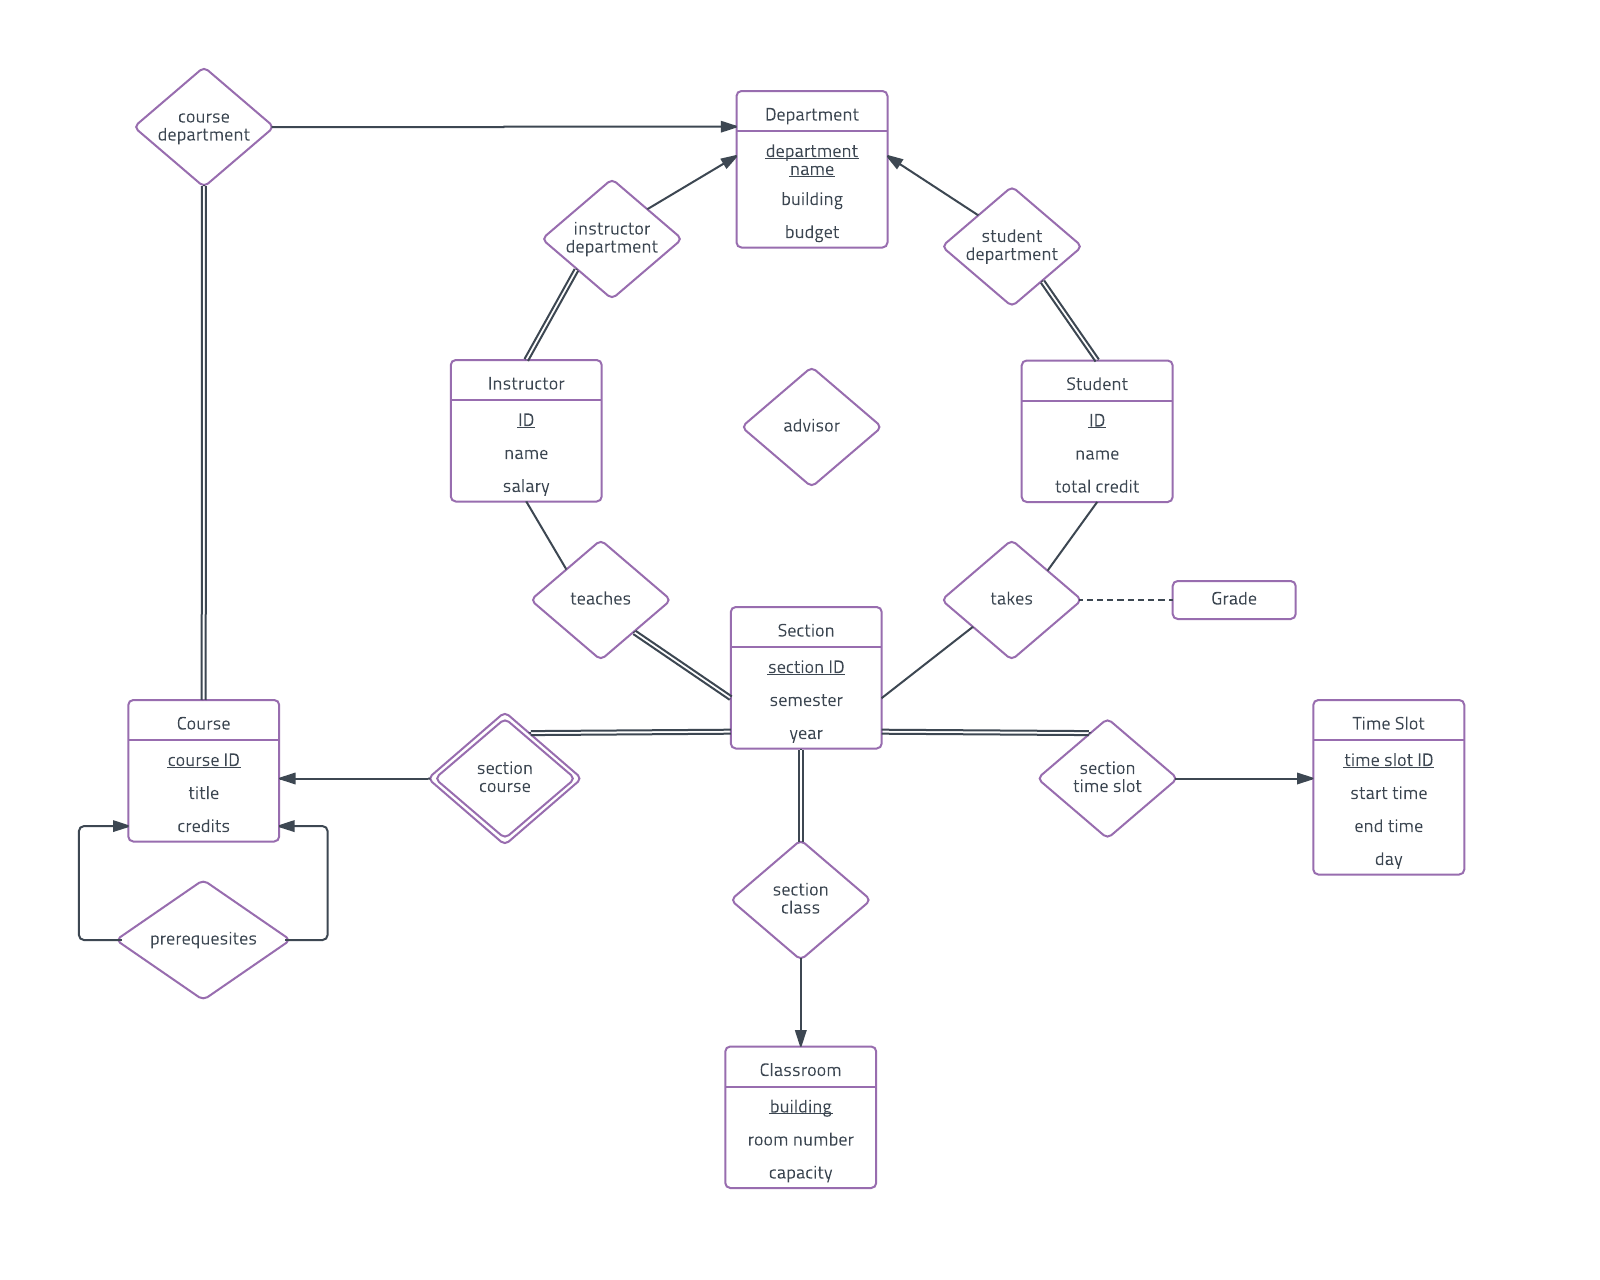 27 Good Entity Relationship Model Diagram Samples